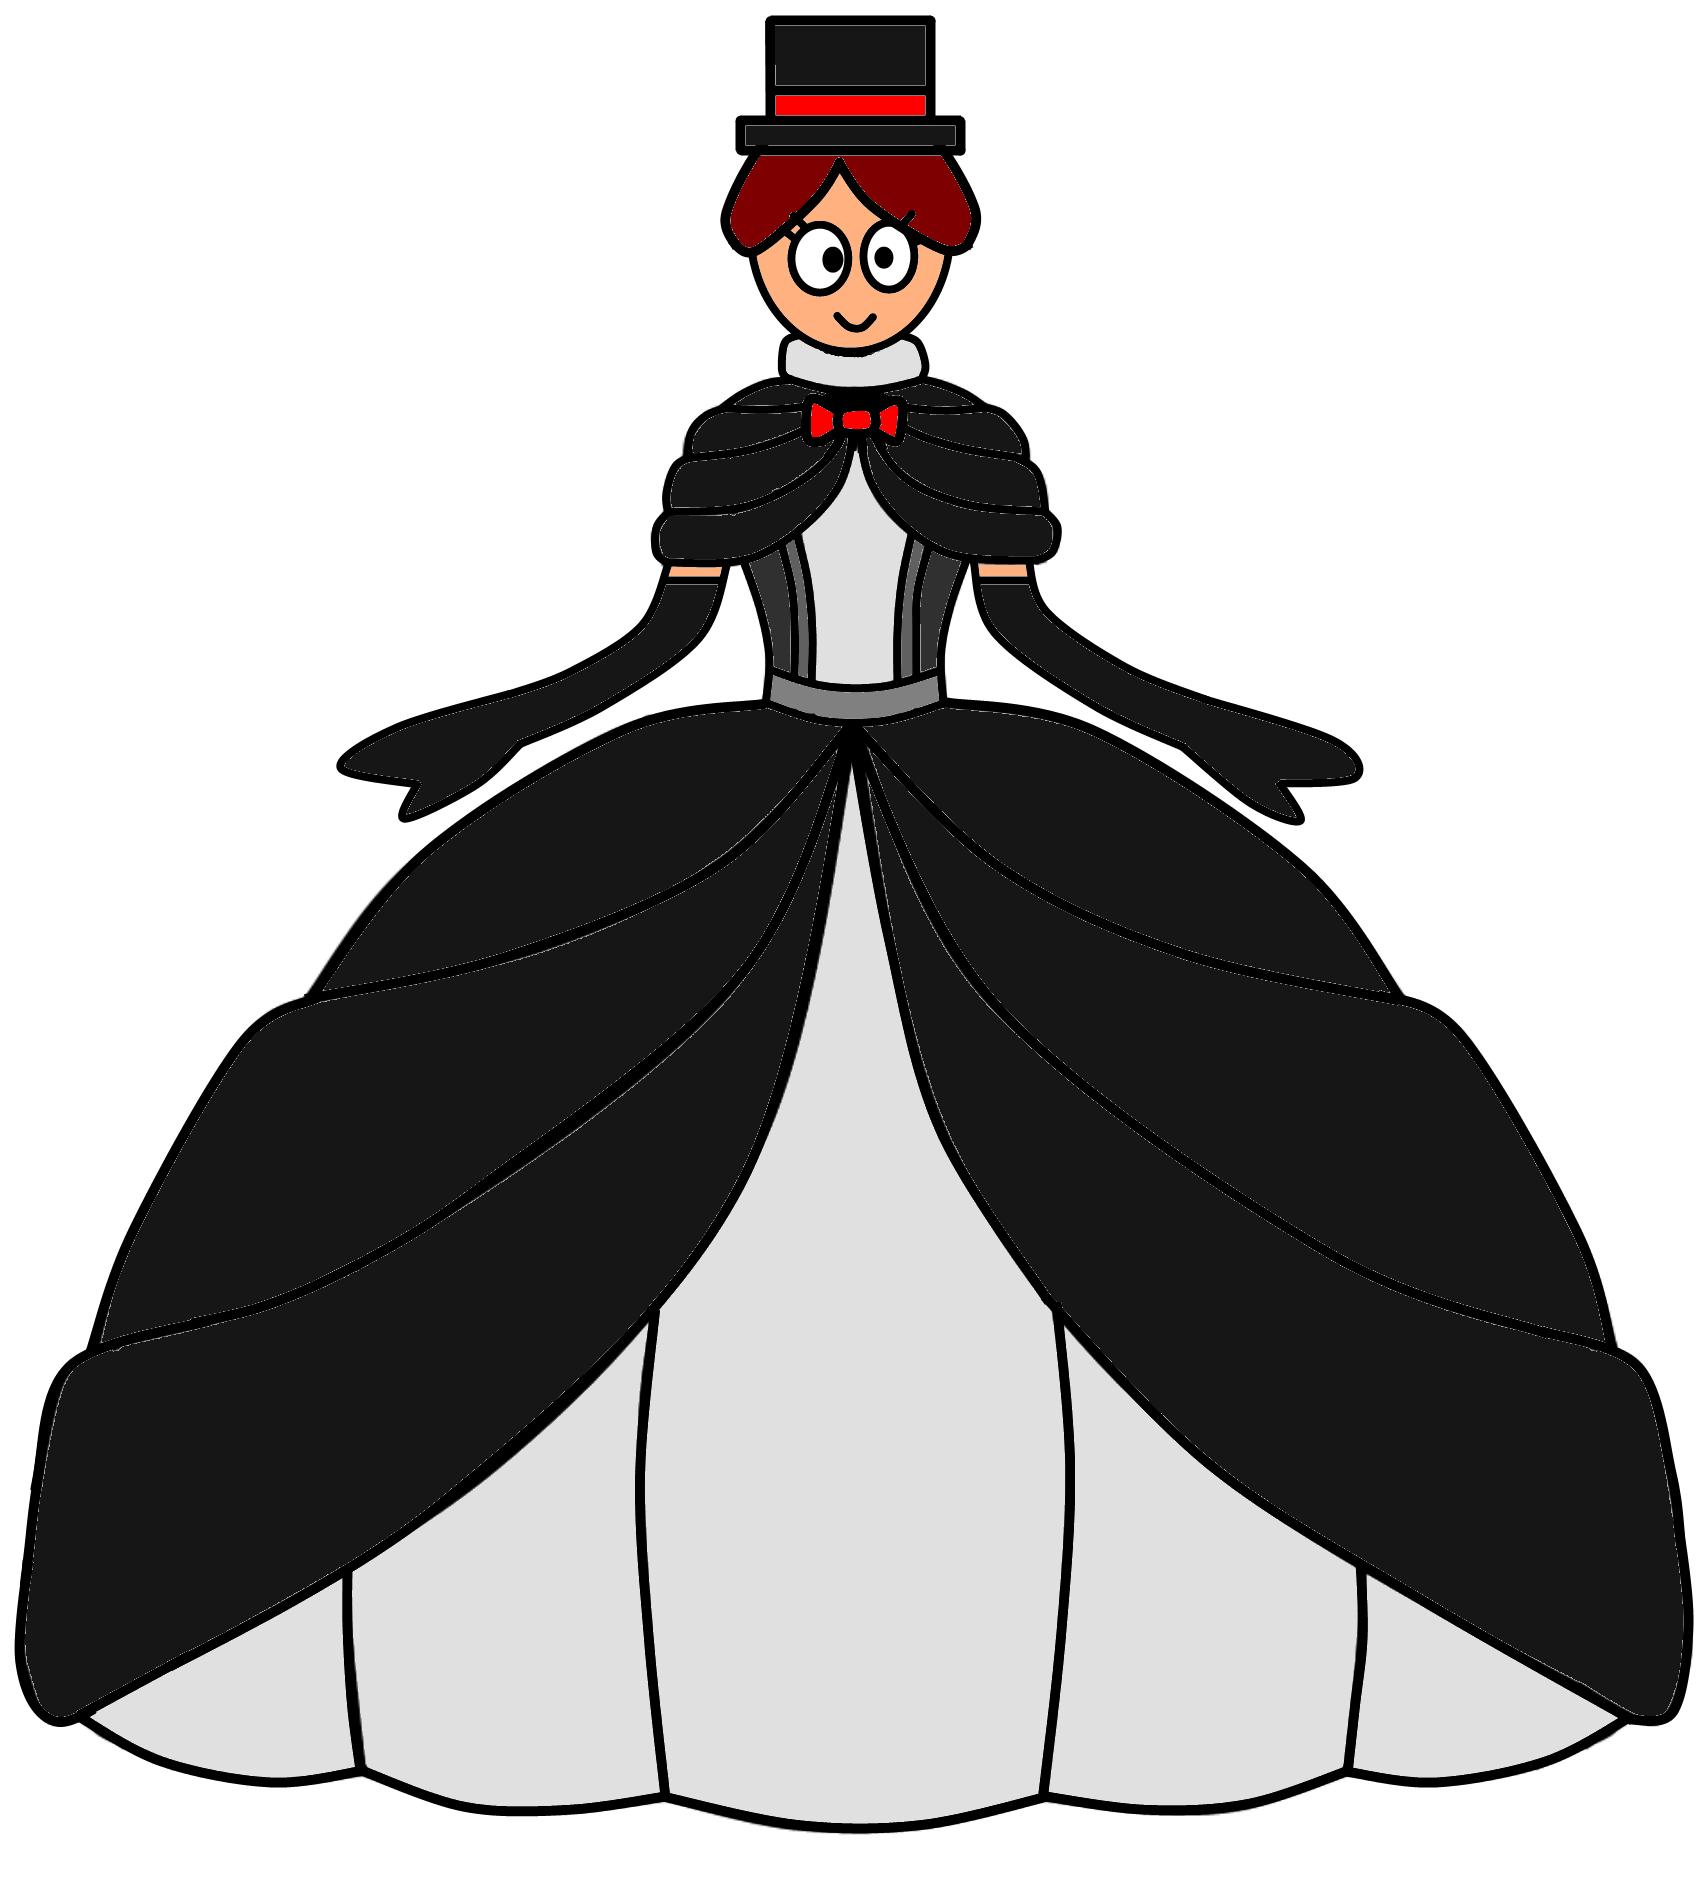 Tuxedo Ball Gown by Jamster93 on DeviantArt